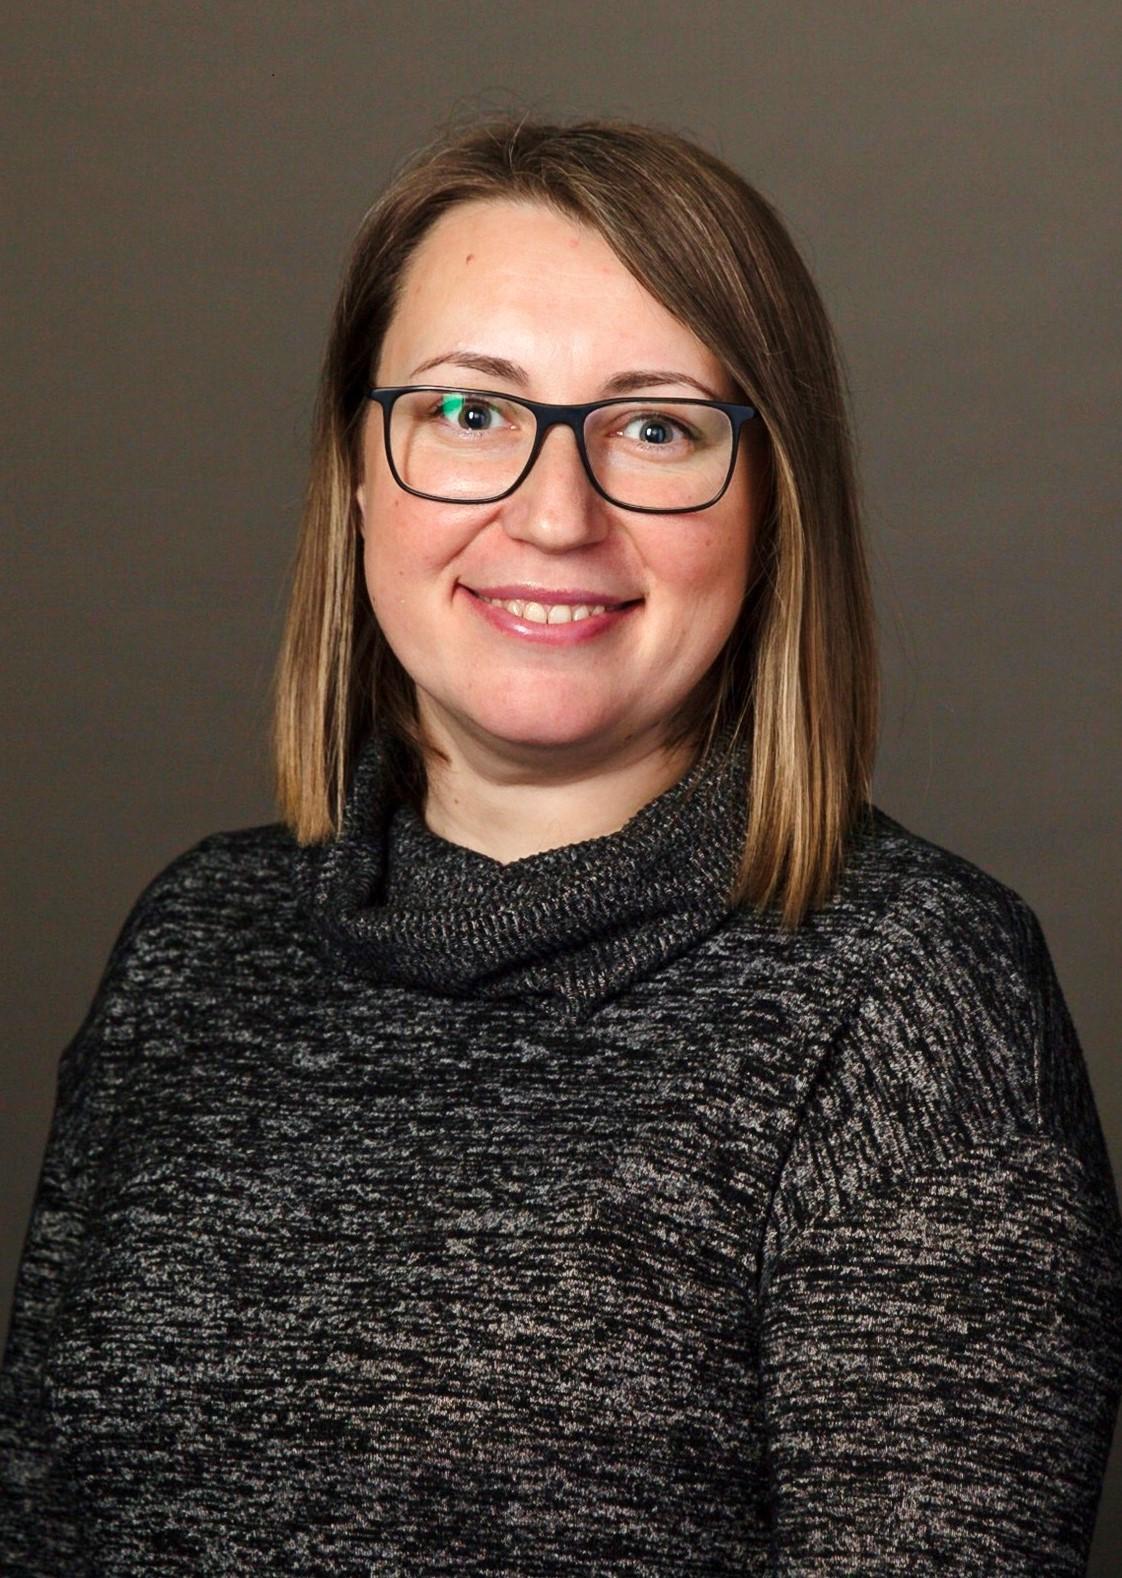 Marta Samokishyn